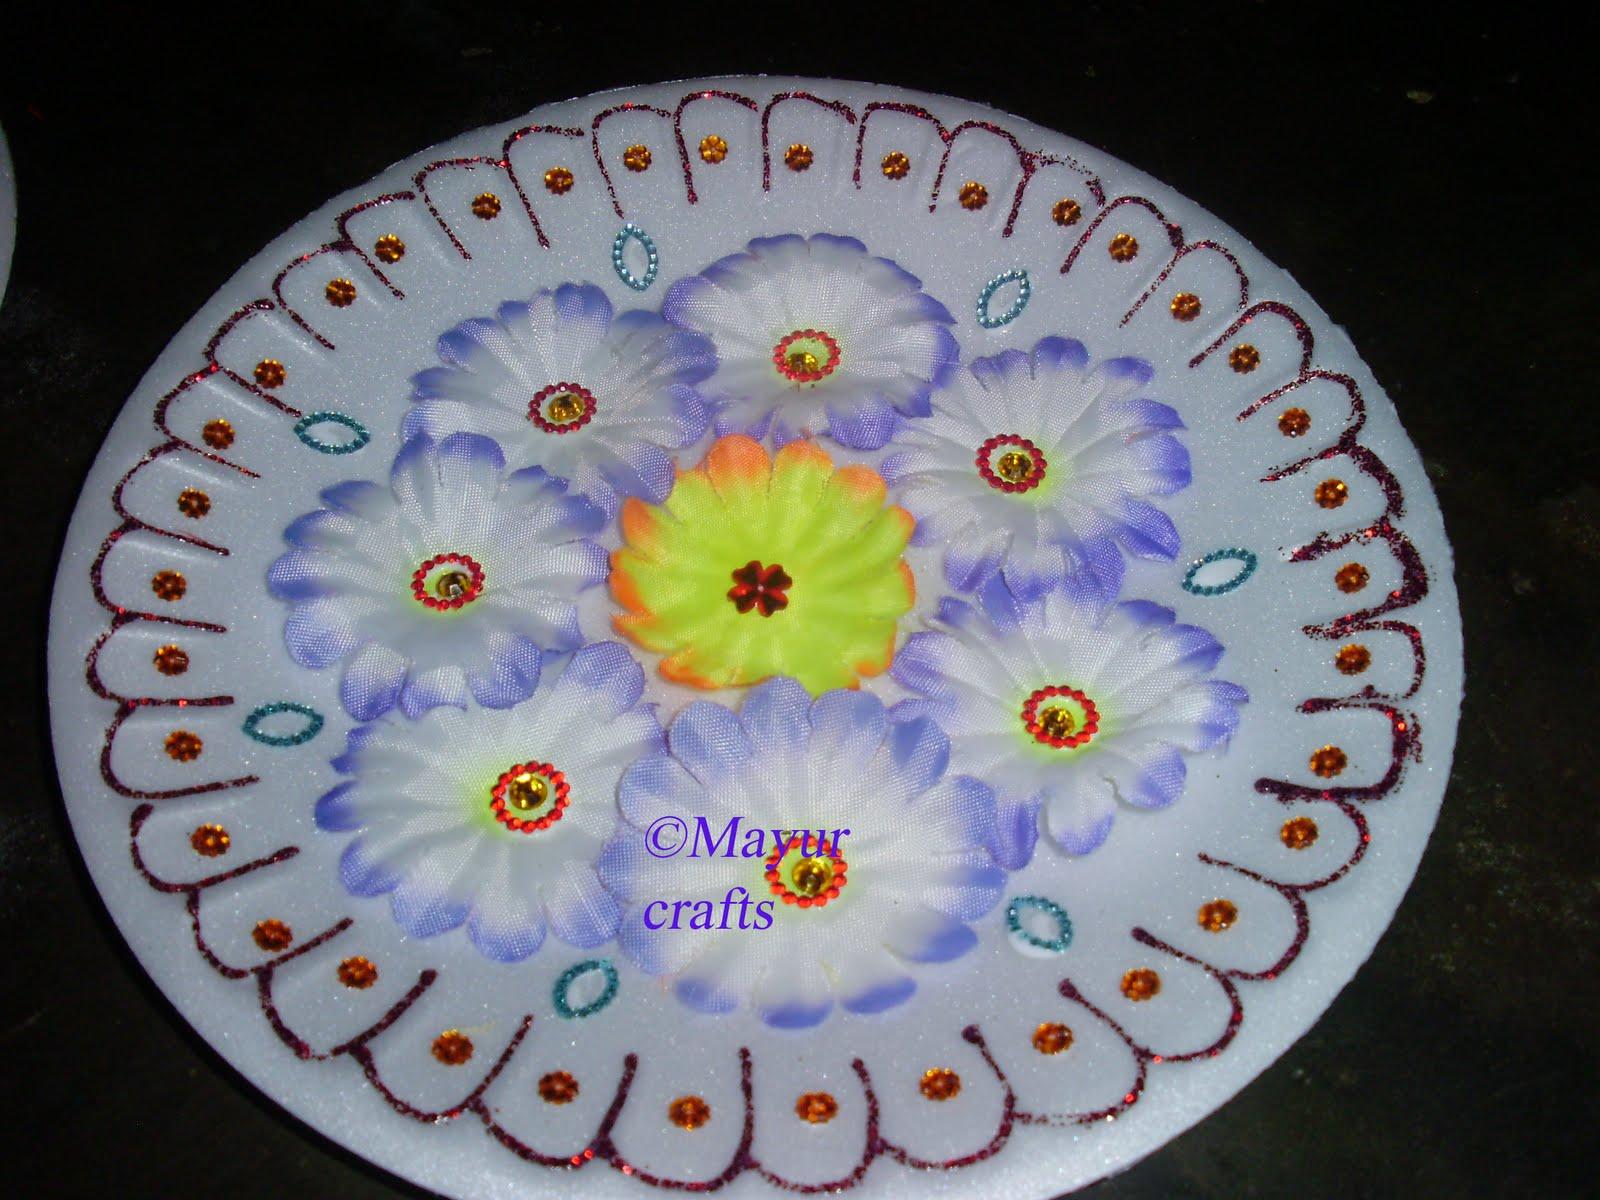 Plate Decoration & Mayur Arts \u0026 Crafts : Plate Decoration